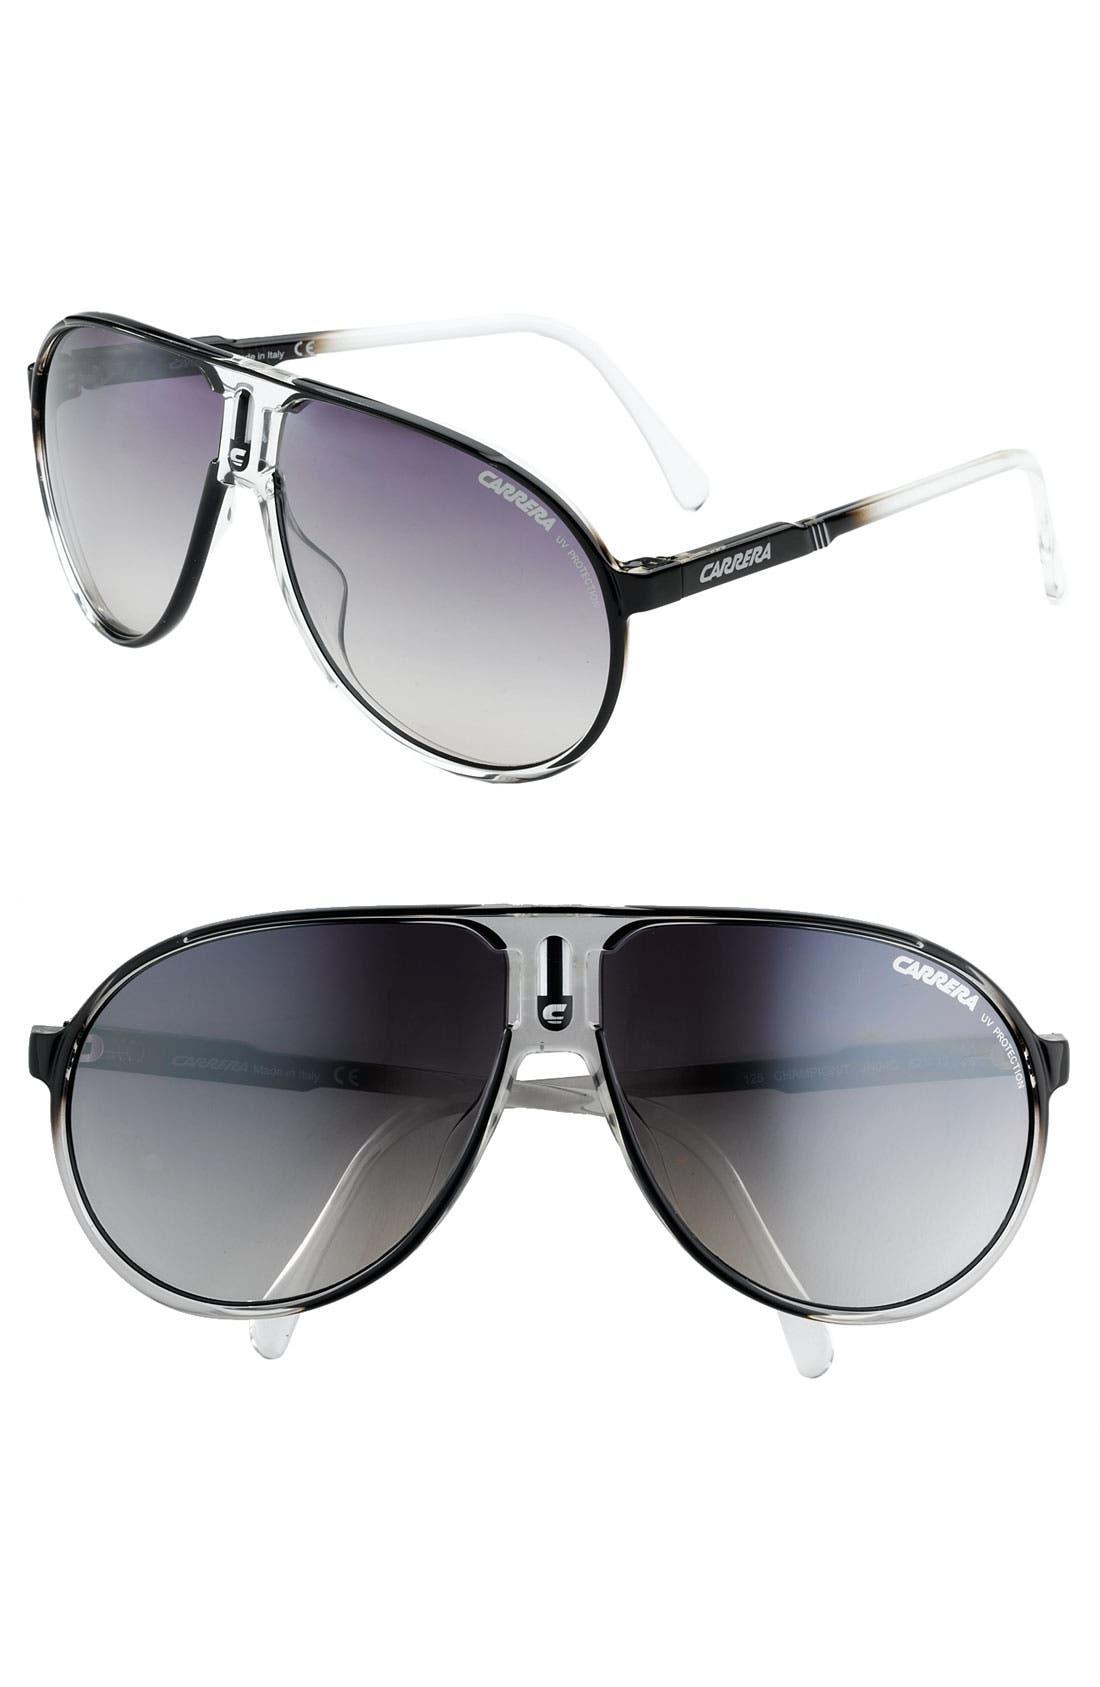 Main Image - Carrera Eyewear 'Champion' Aviator Sunglasses